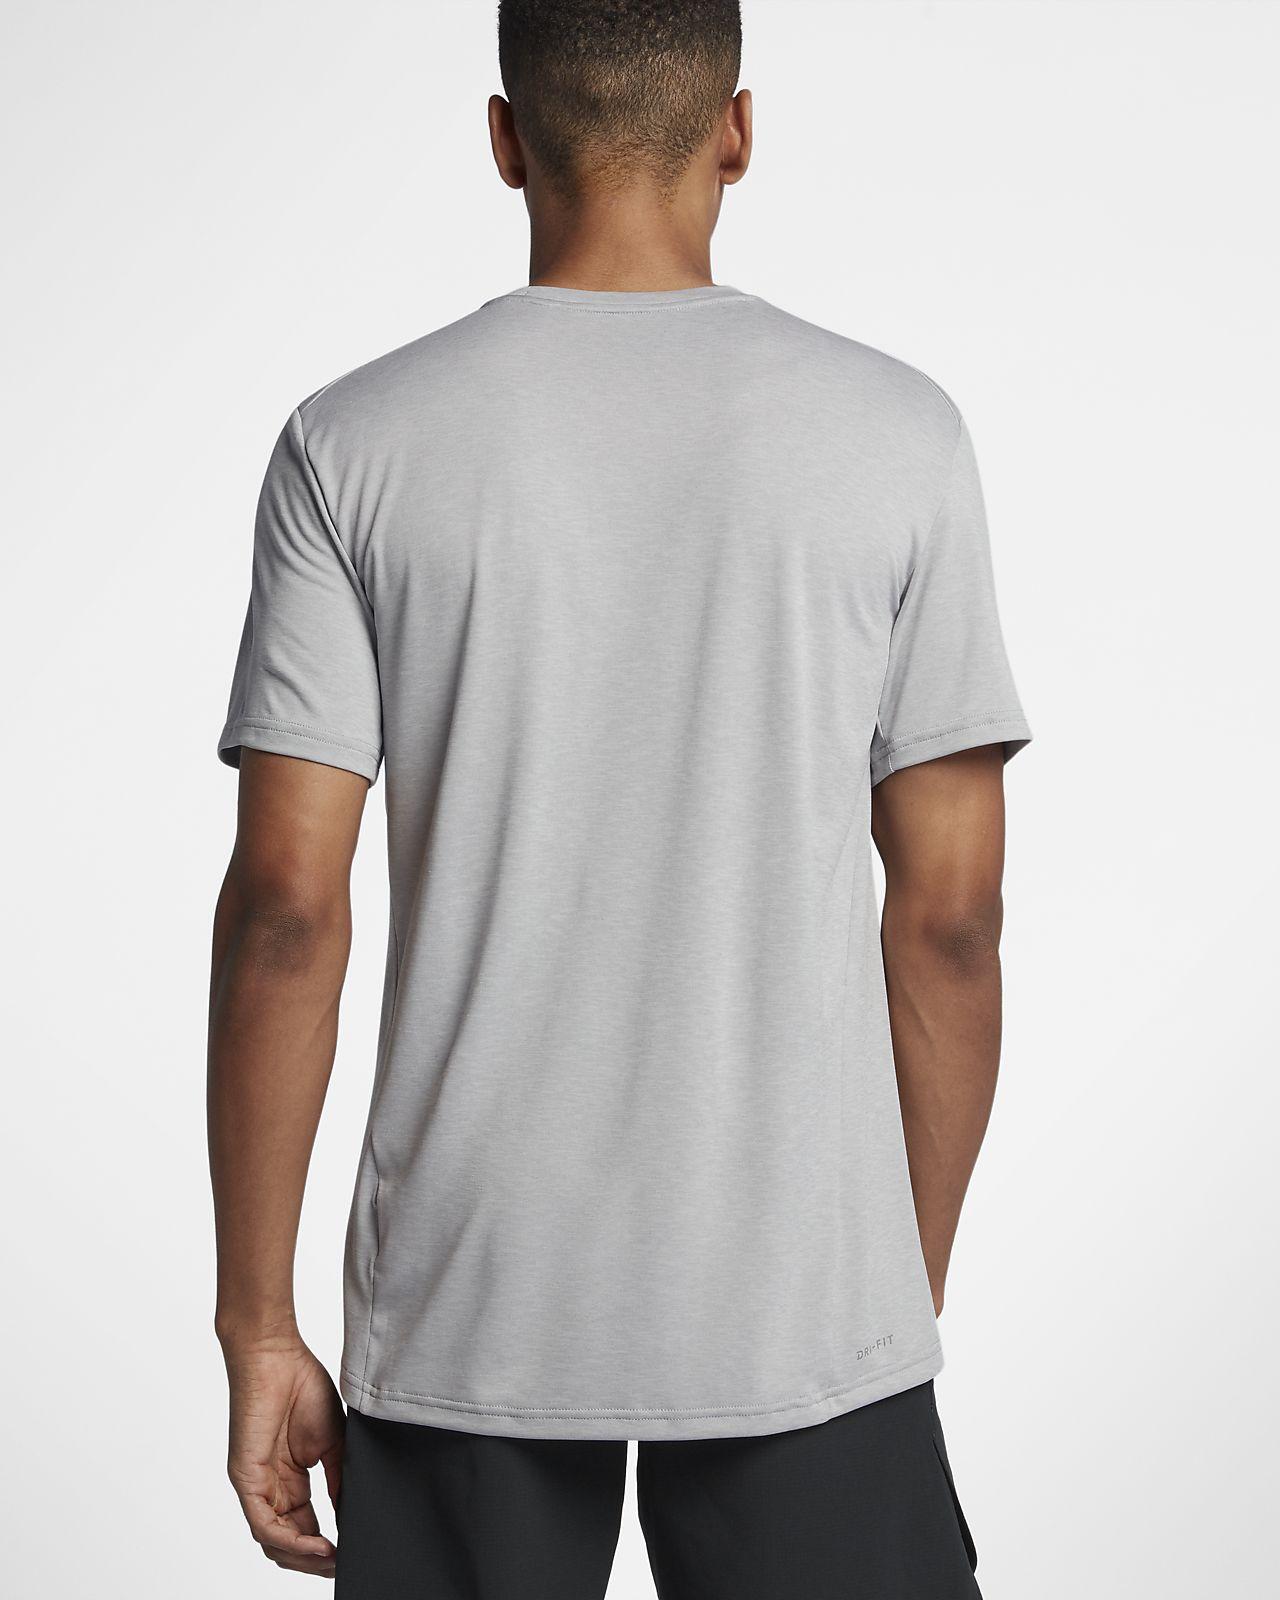 huge discount 6f8e6 7ce6c ... Nike Breathe Men s Short Sleeve Training Top